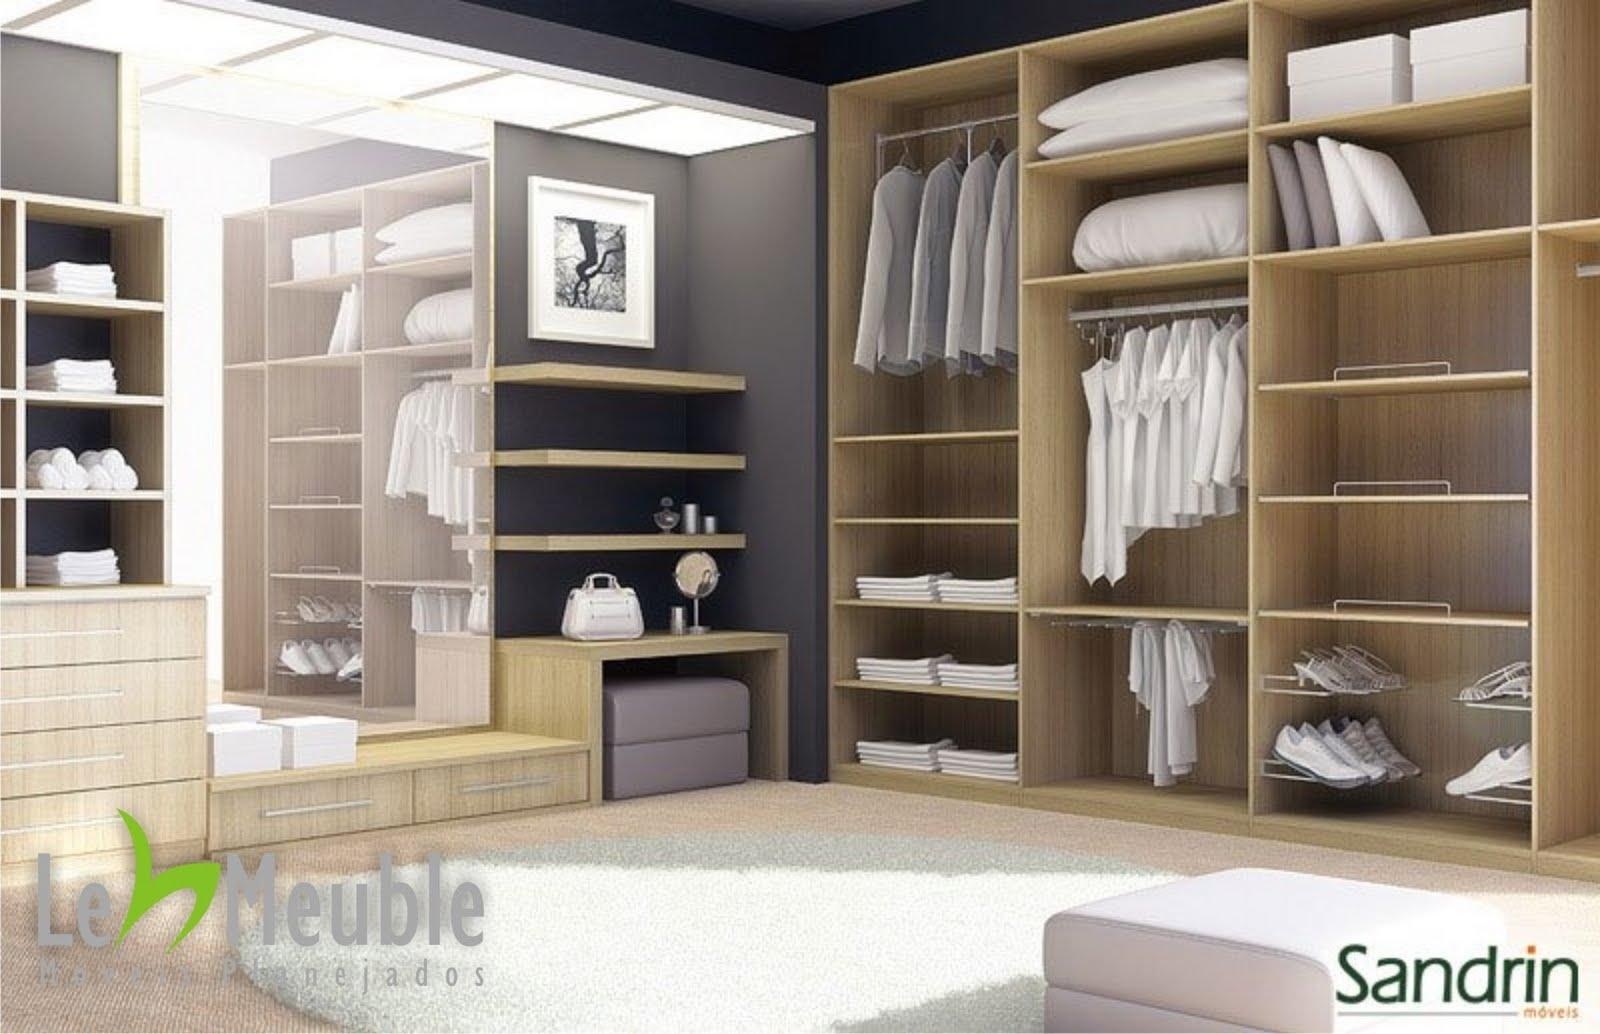 Le meuble projetos de interiores cat logo sandrin closet for Catalogo de closets